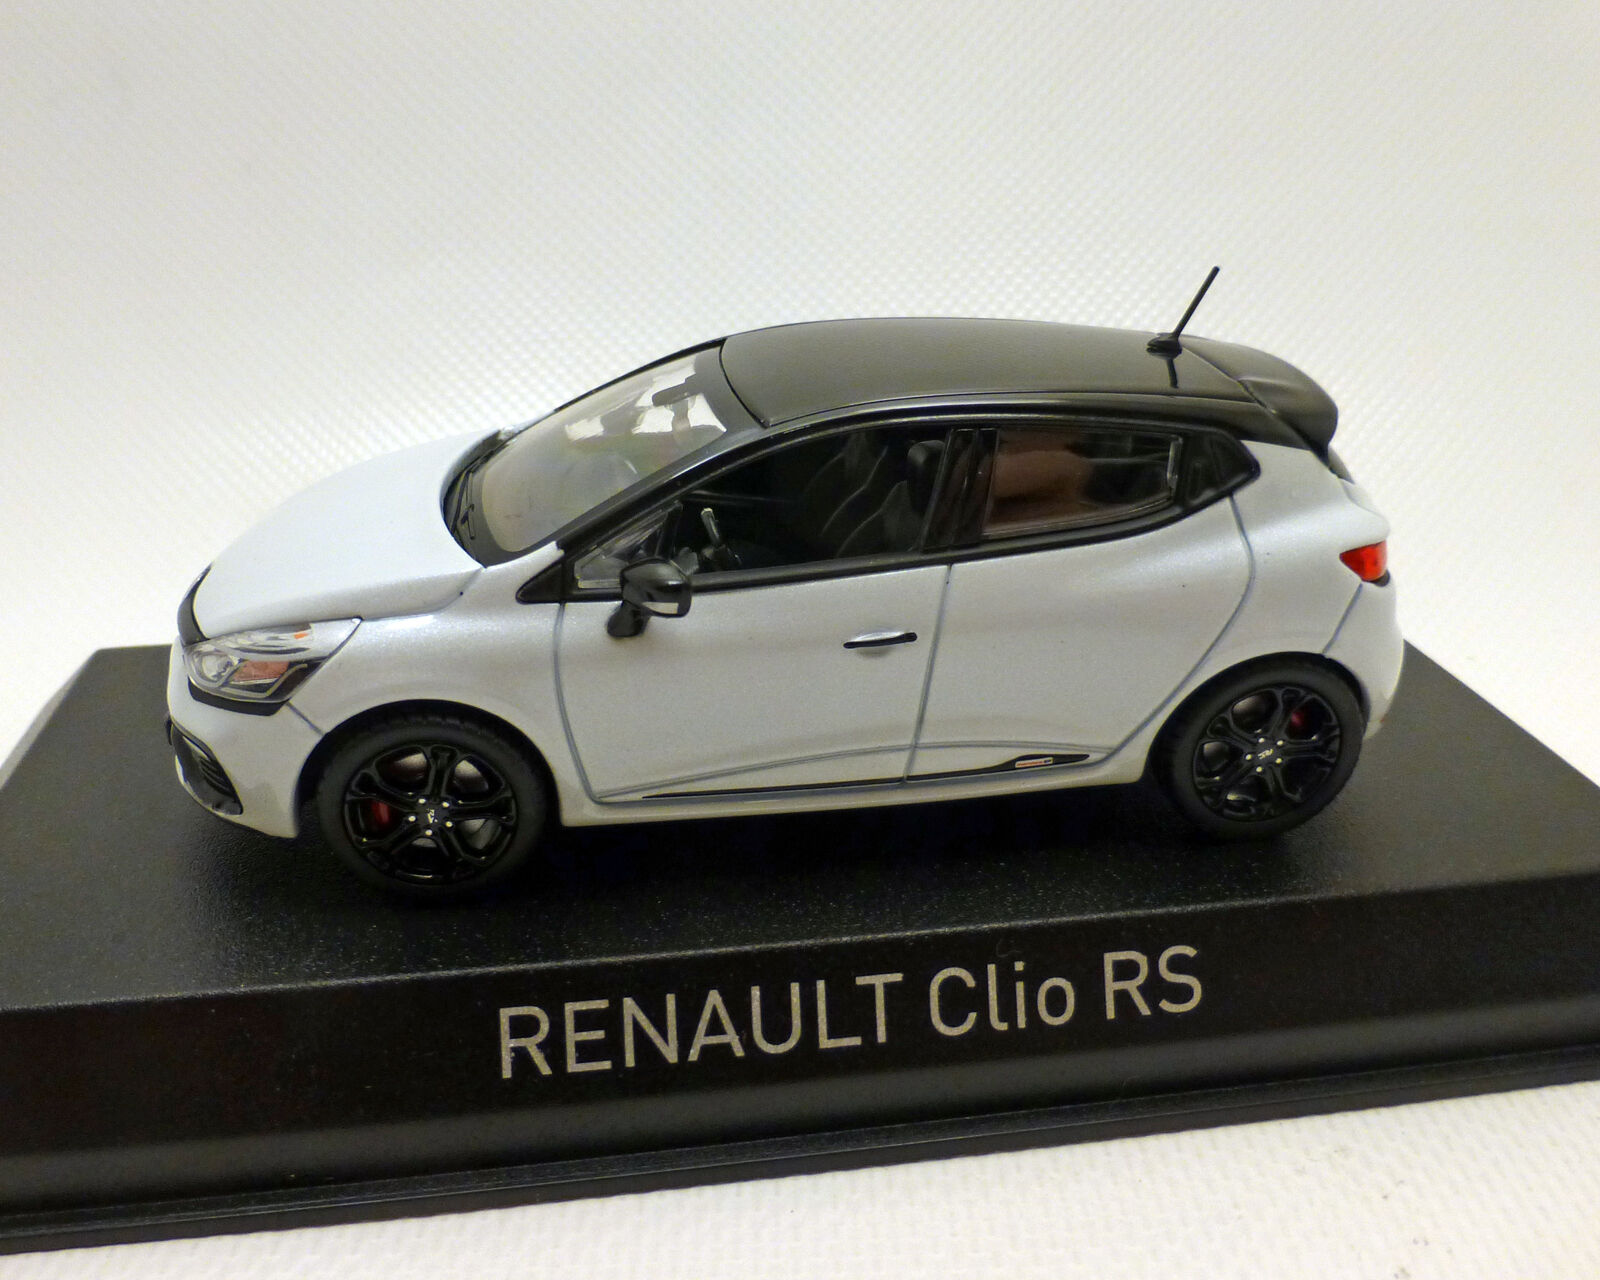 Renault Clio RS, Monaco, GP 2014, NOREV 1 43  | Grüne, neue Technologie